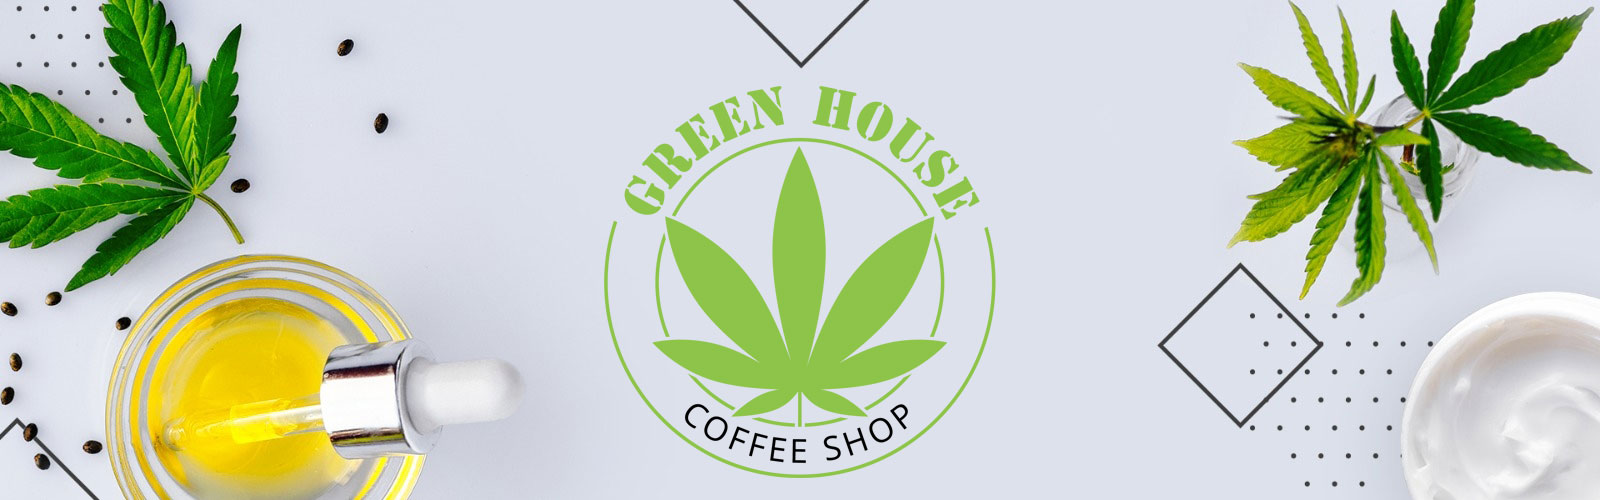 comment acheter chez green house